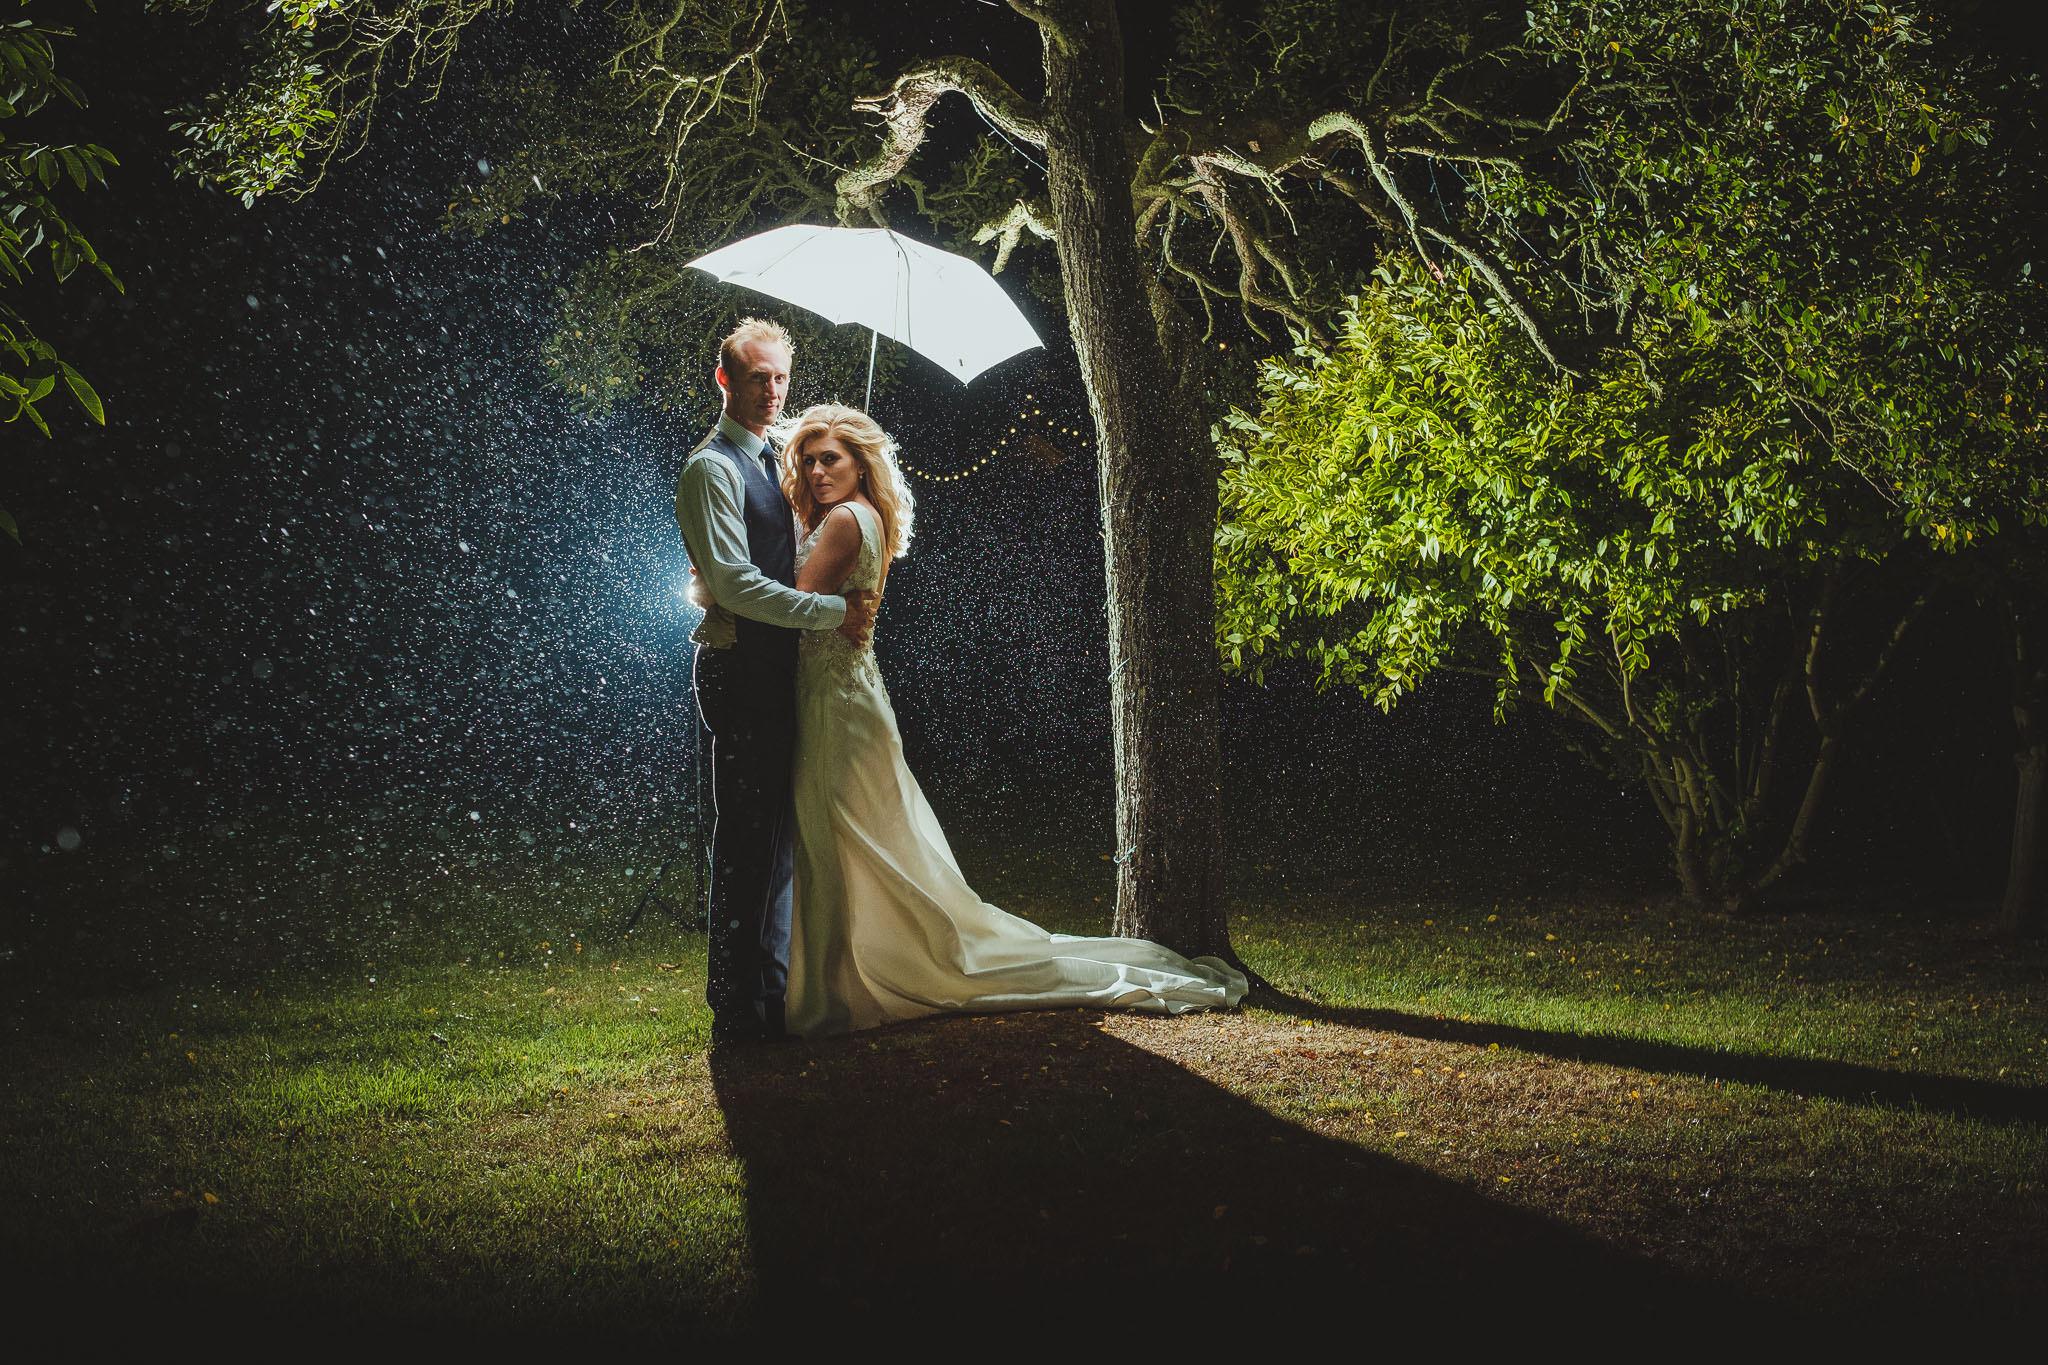 You can get good wedding photos after nightfall with a decent photographer.